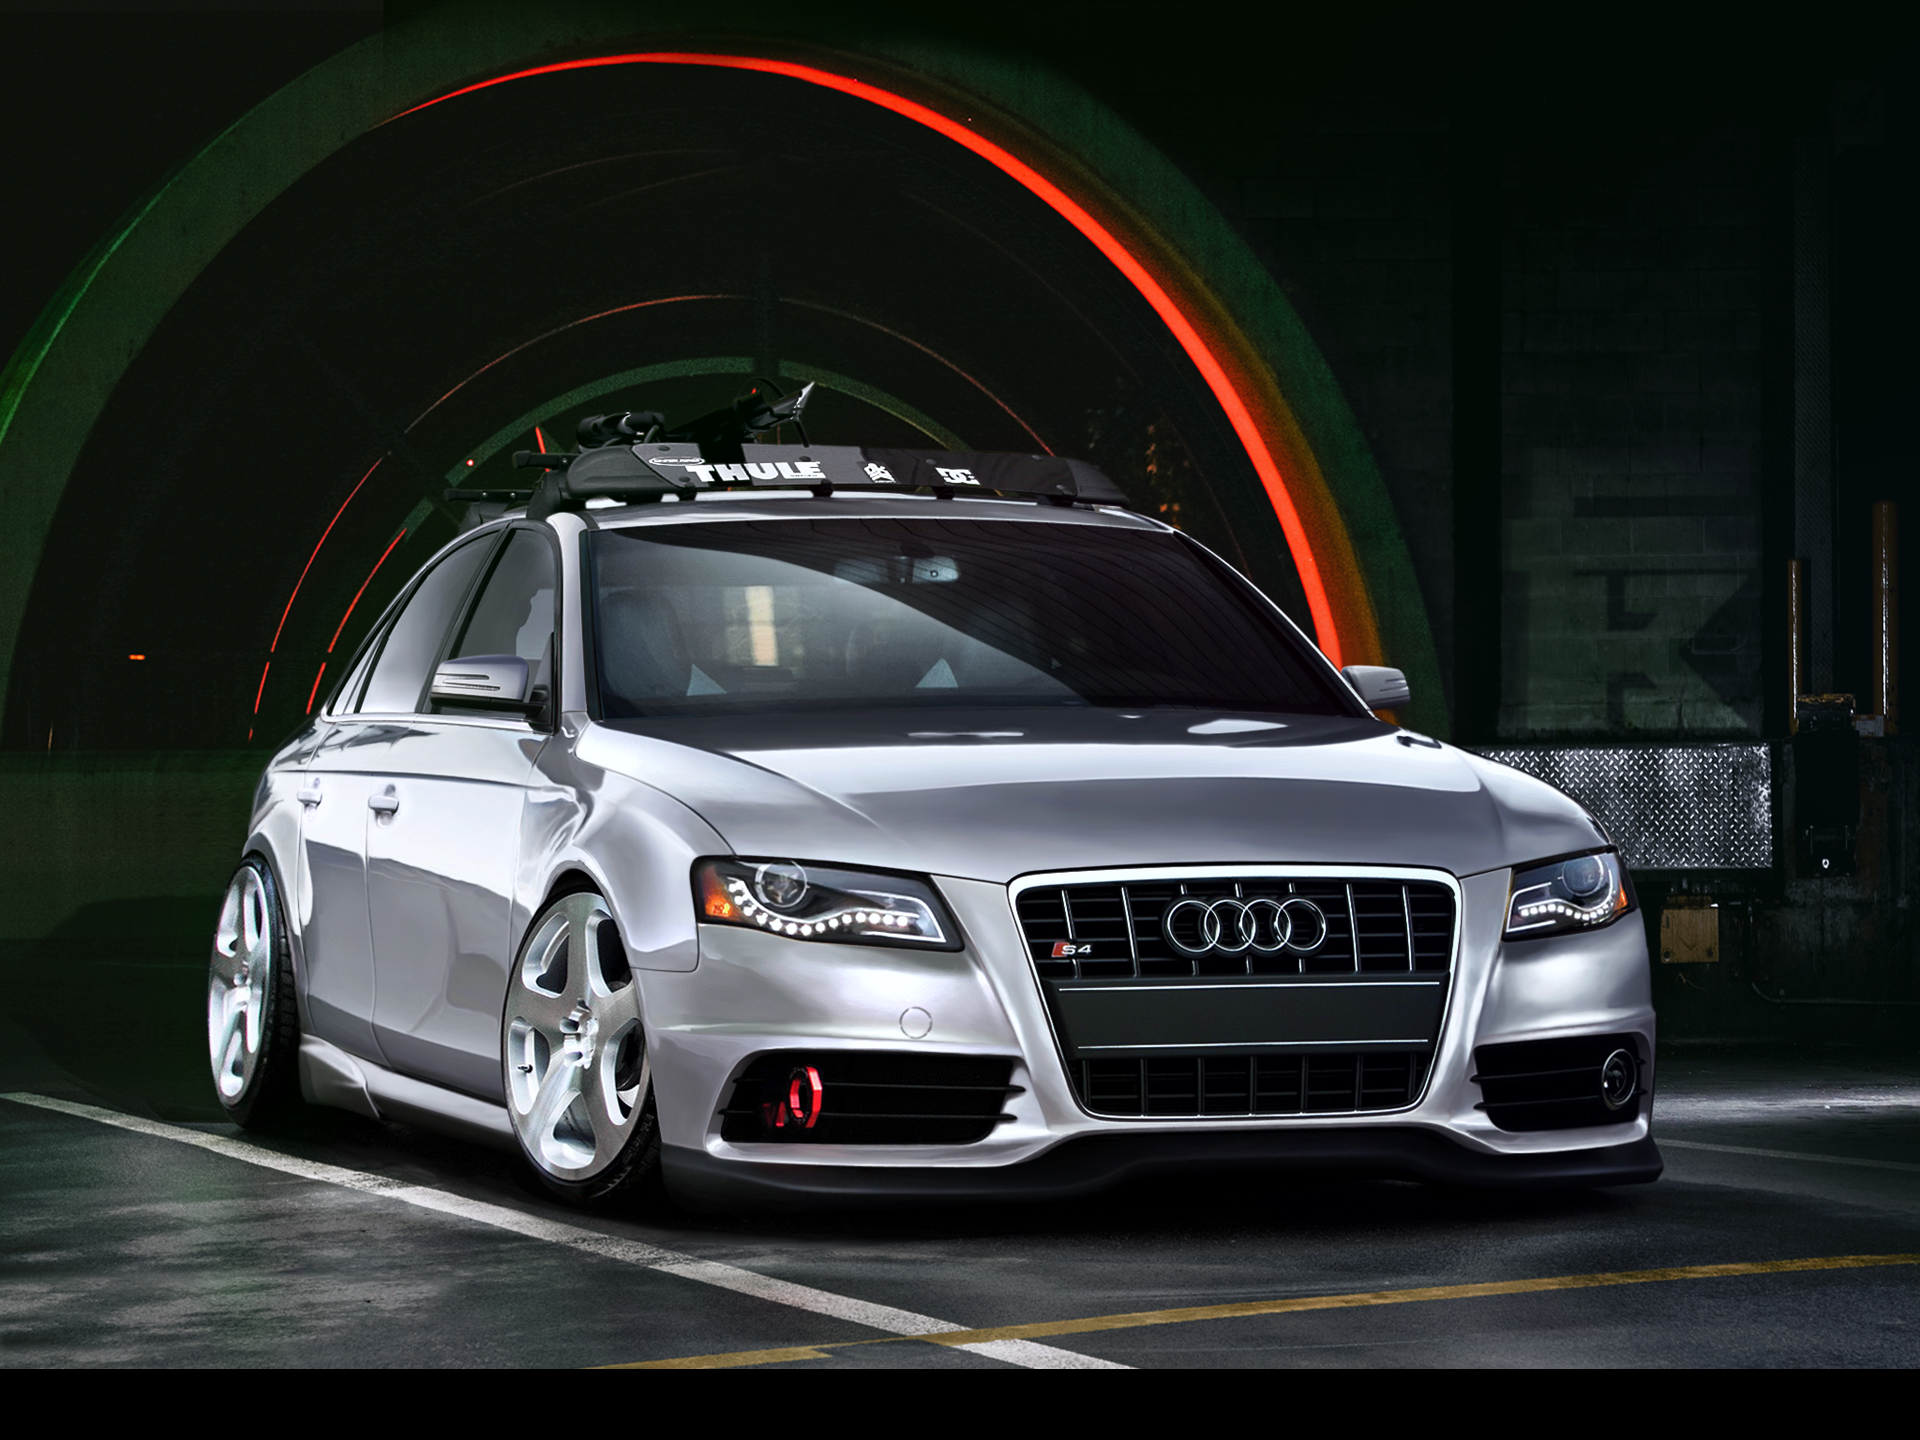 Audi S4 by BitFabio